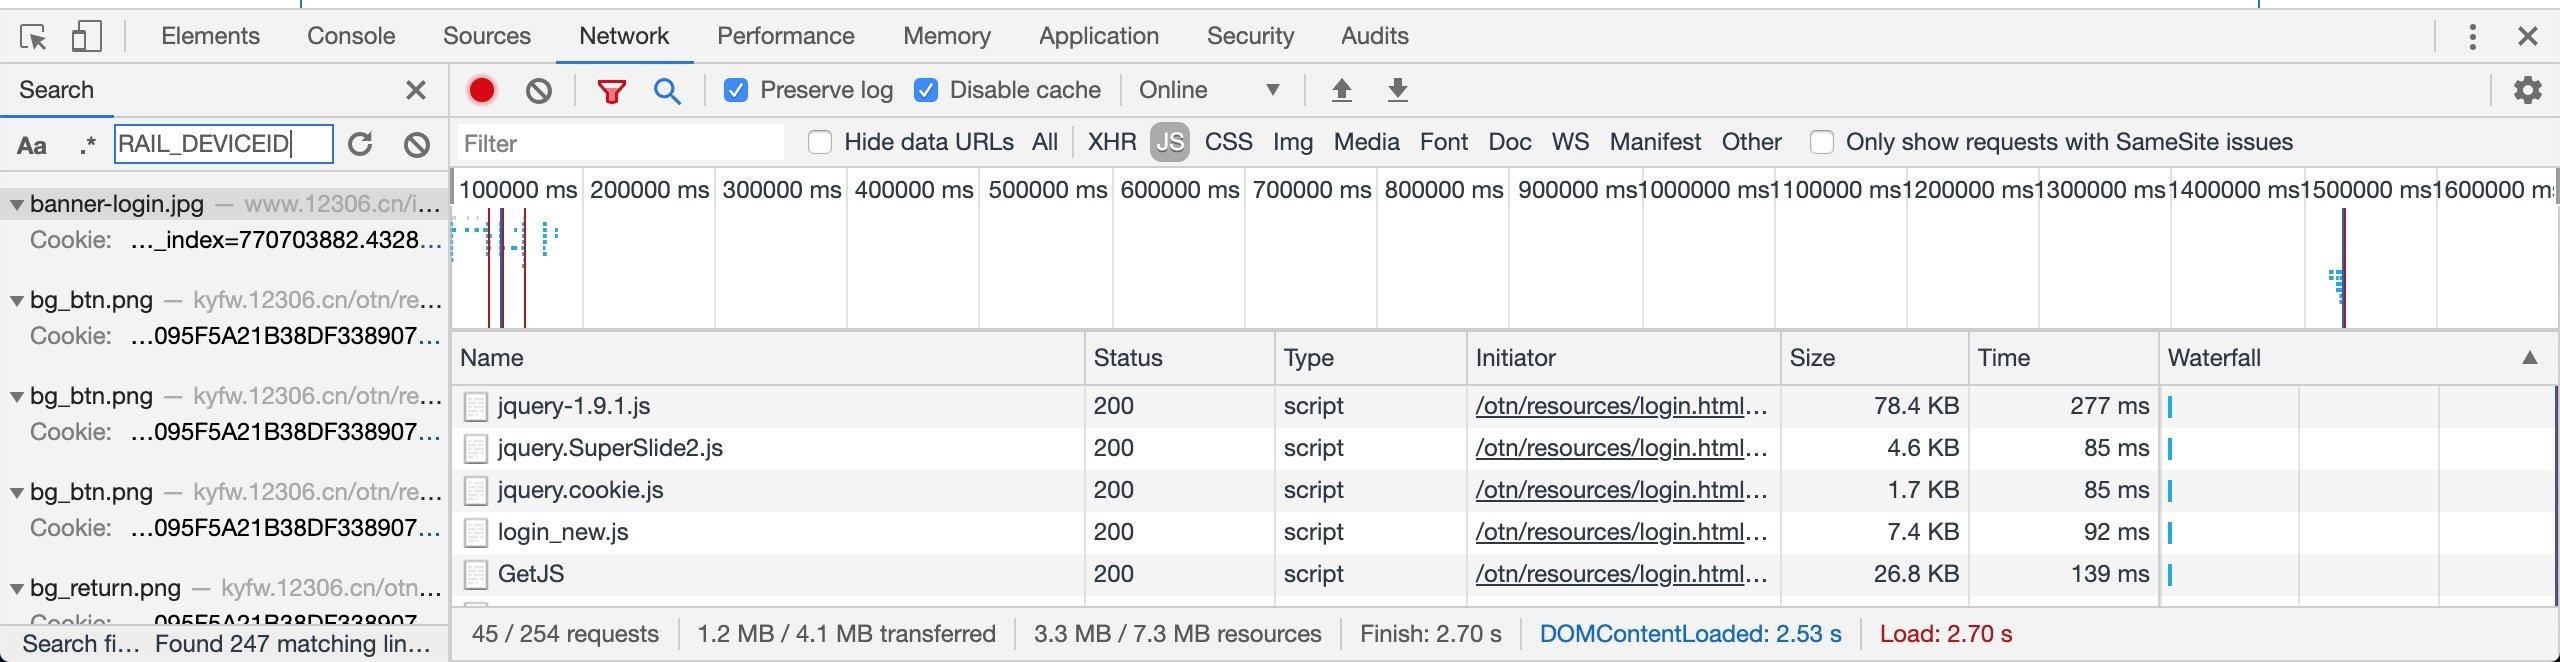 12306-algorithm-web-js-network-search-result.png